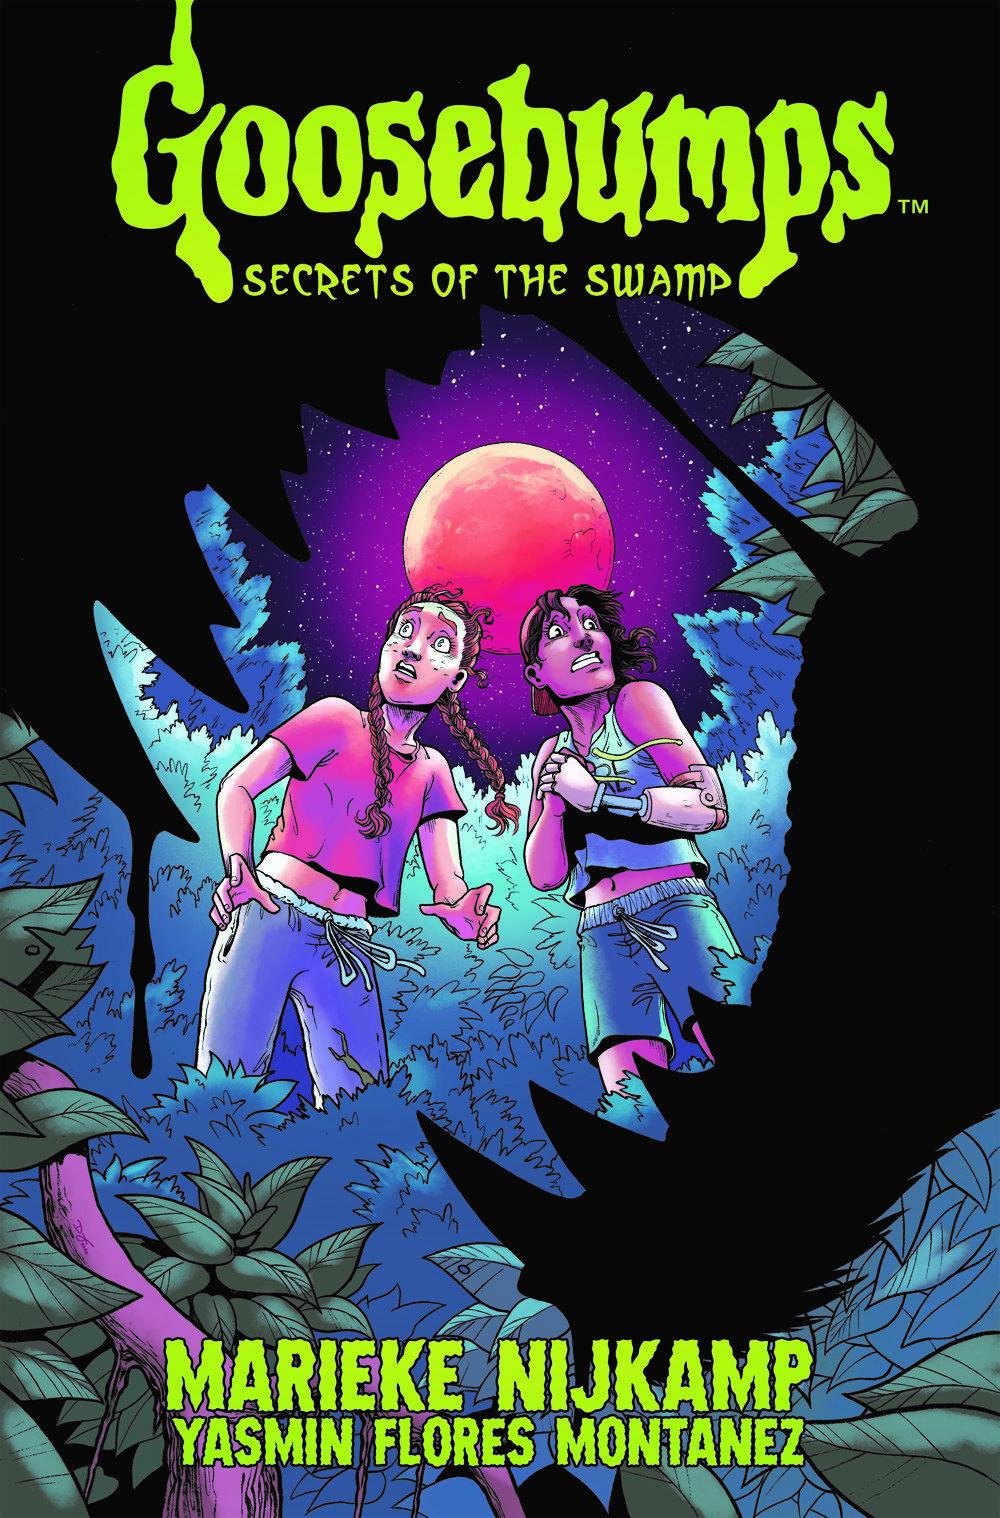 Goosebumps_SotS_cvr ComicList Previews: GOOSEBUMPS SECRET OF THE SWAMP TP